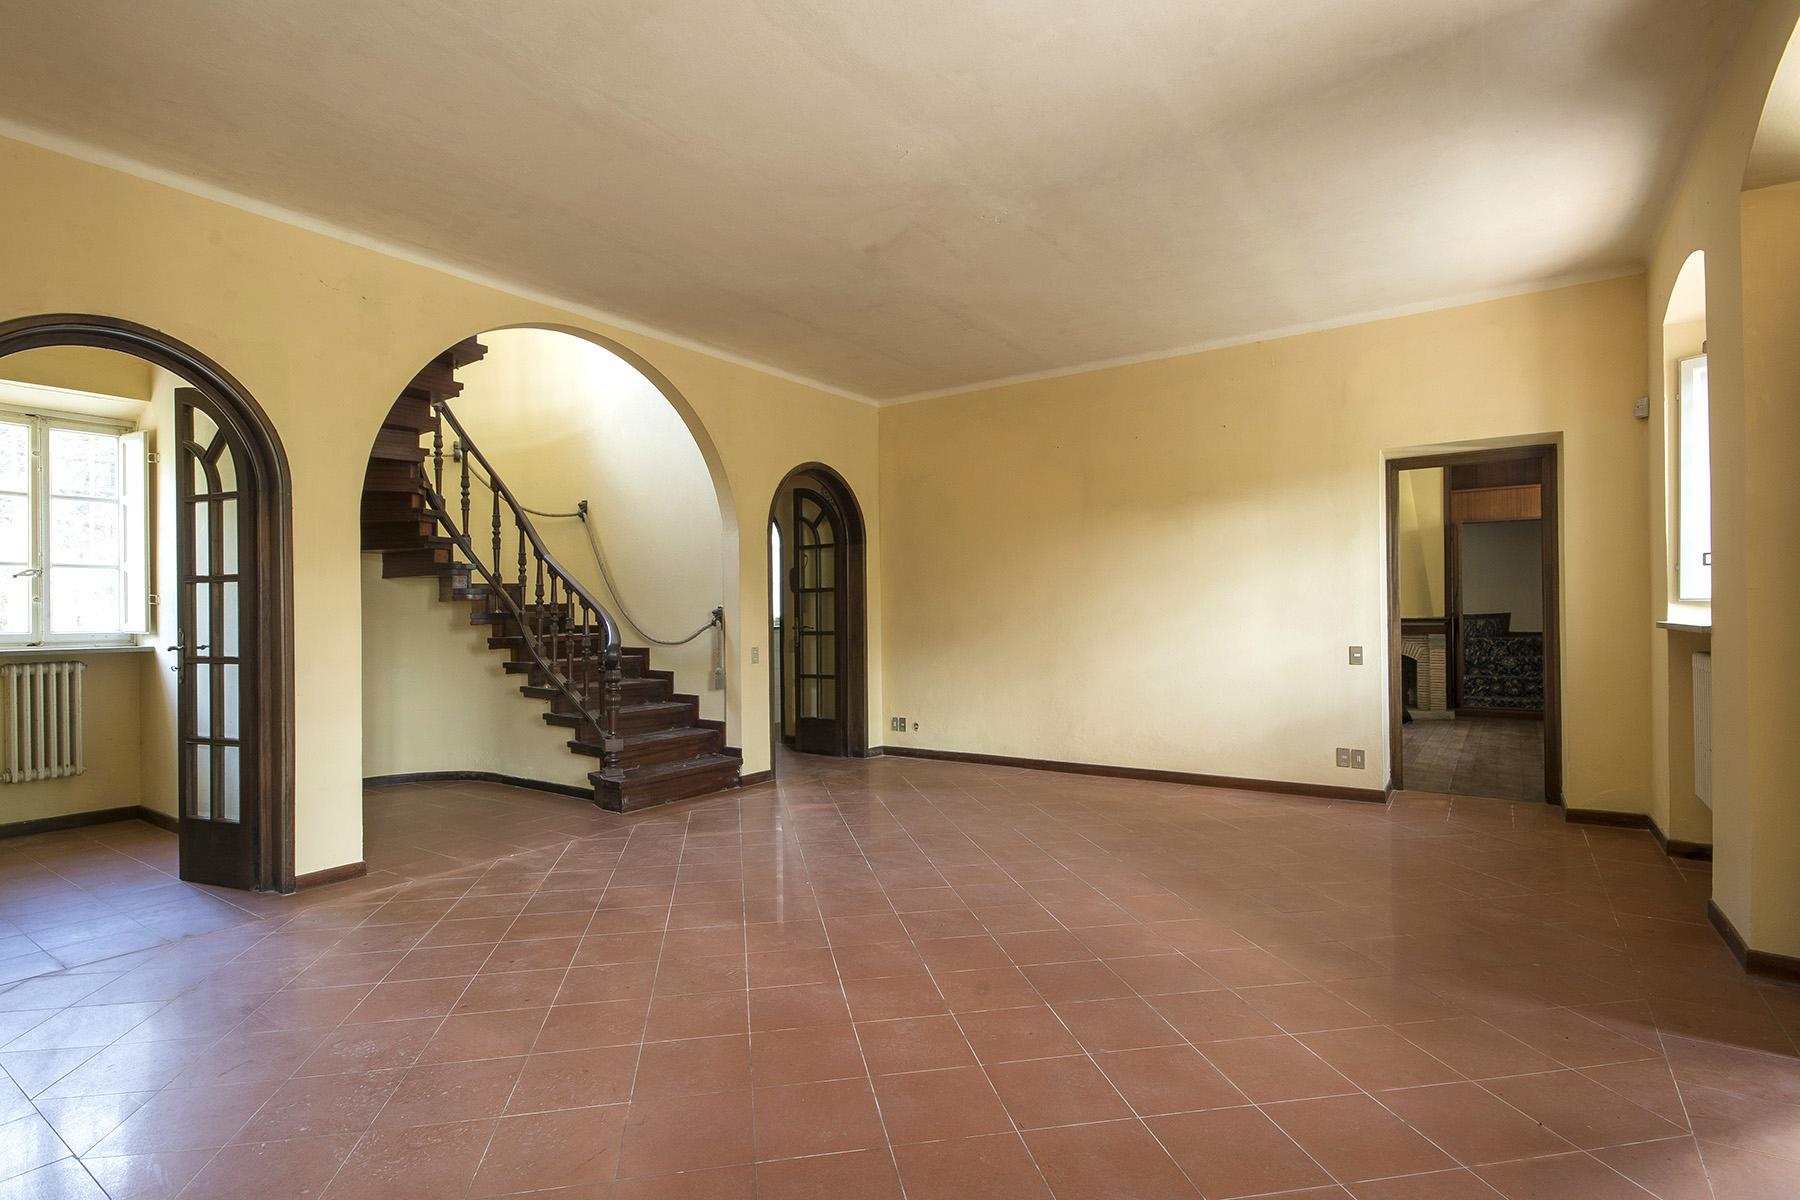 Villa in Vendita a Lucca: 5 locali, 700 mq - Foto 5